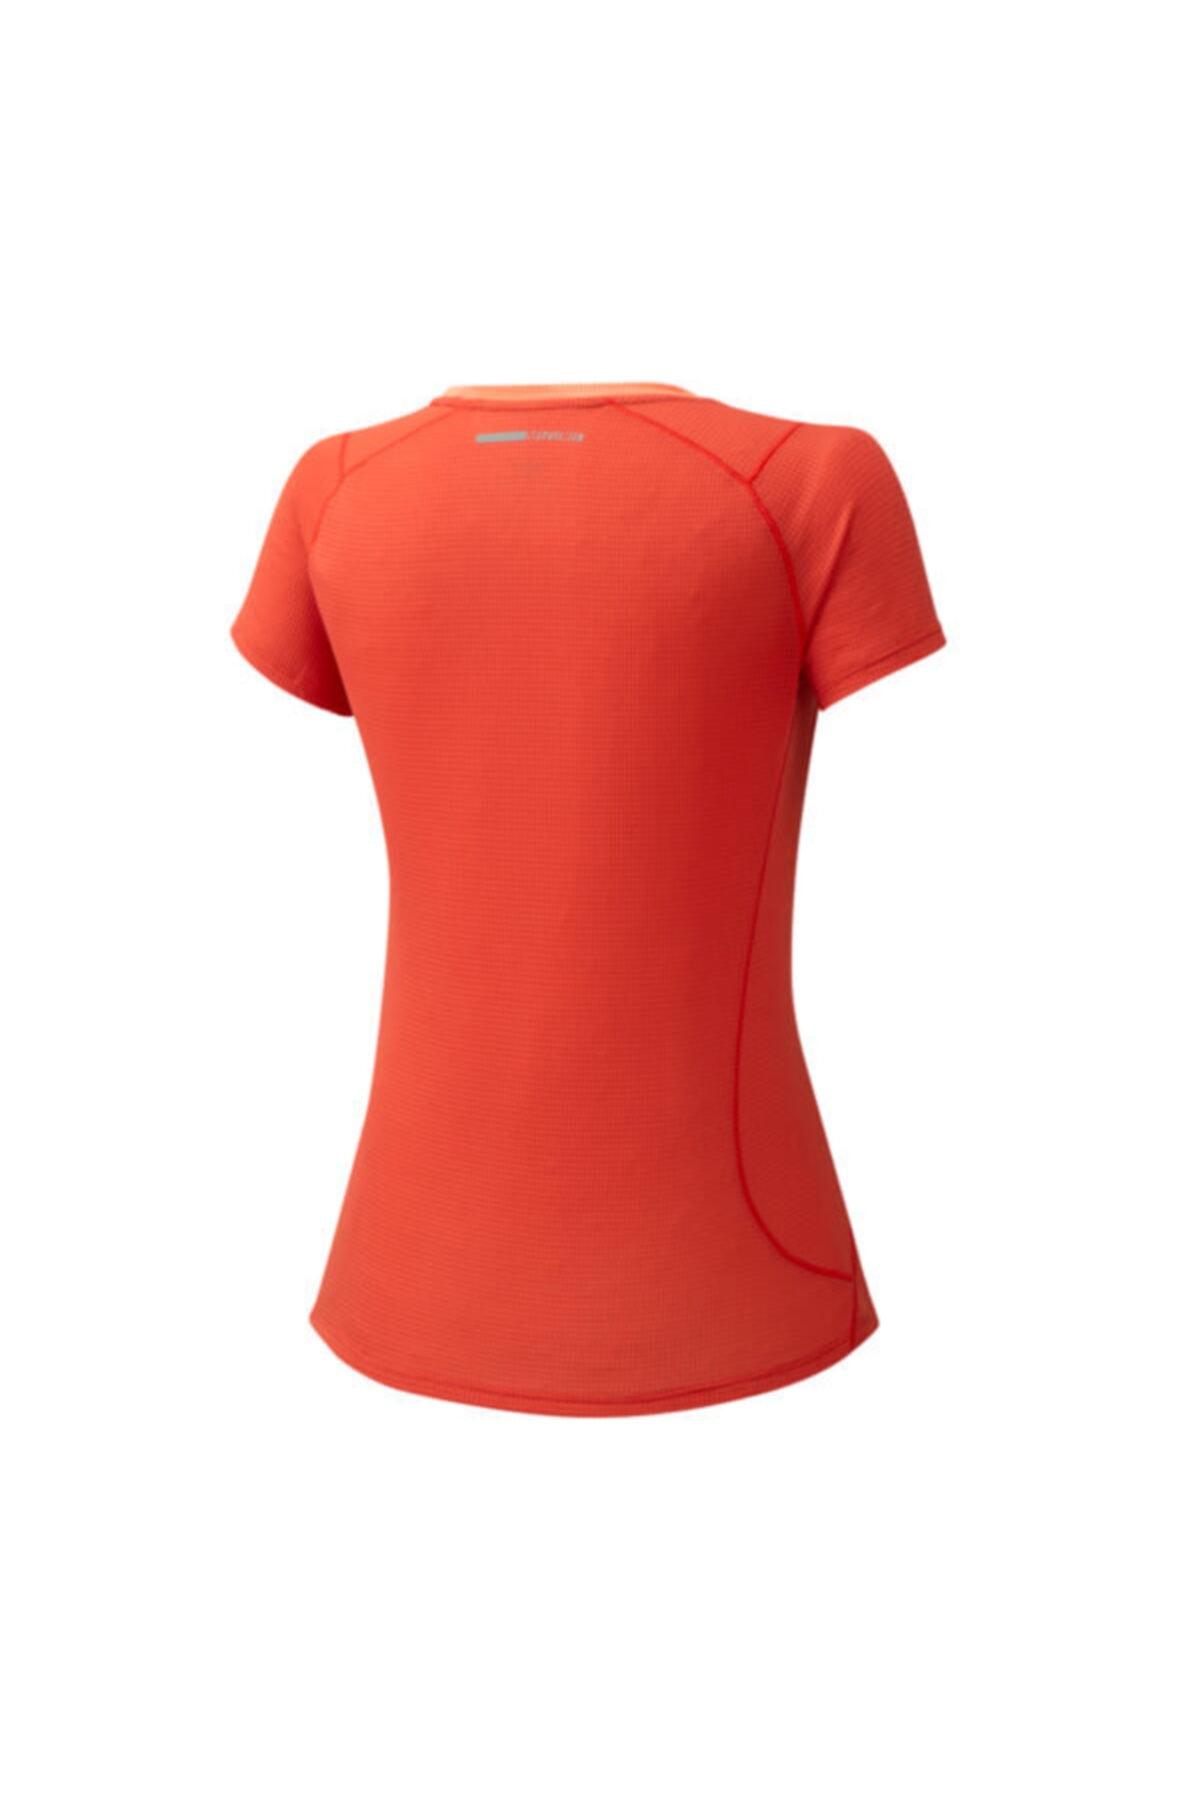 MIZUNO Dry Aeroflow Tee Kadın Turuncu T-shirt 2